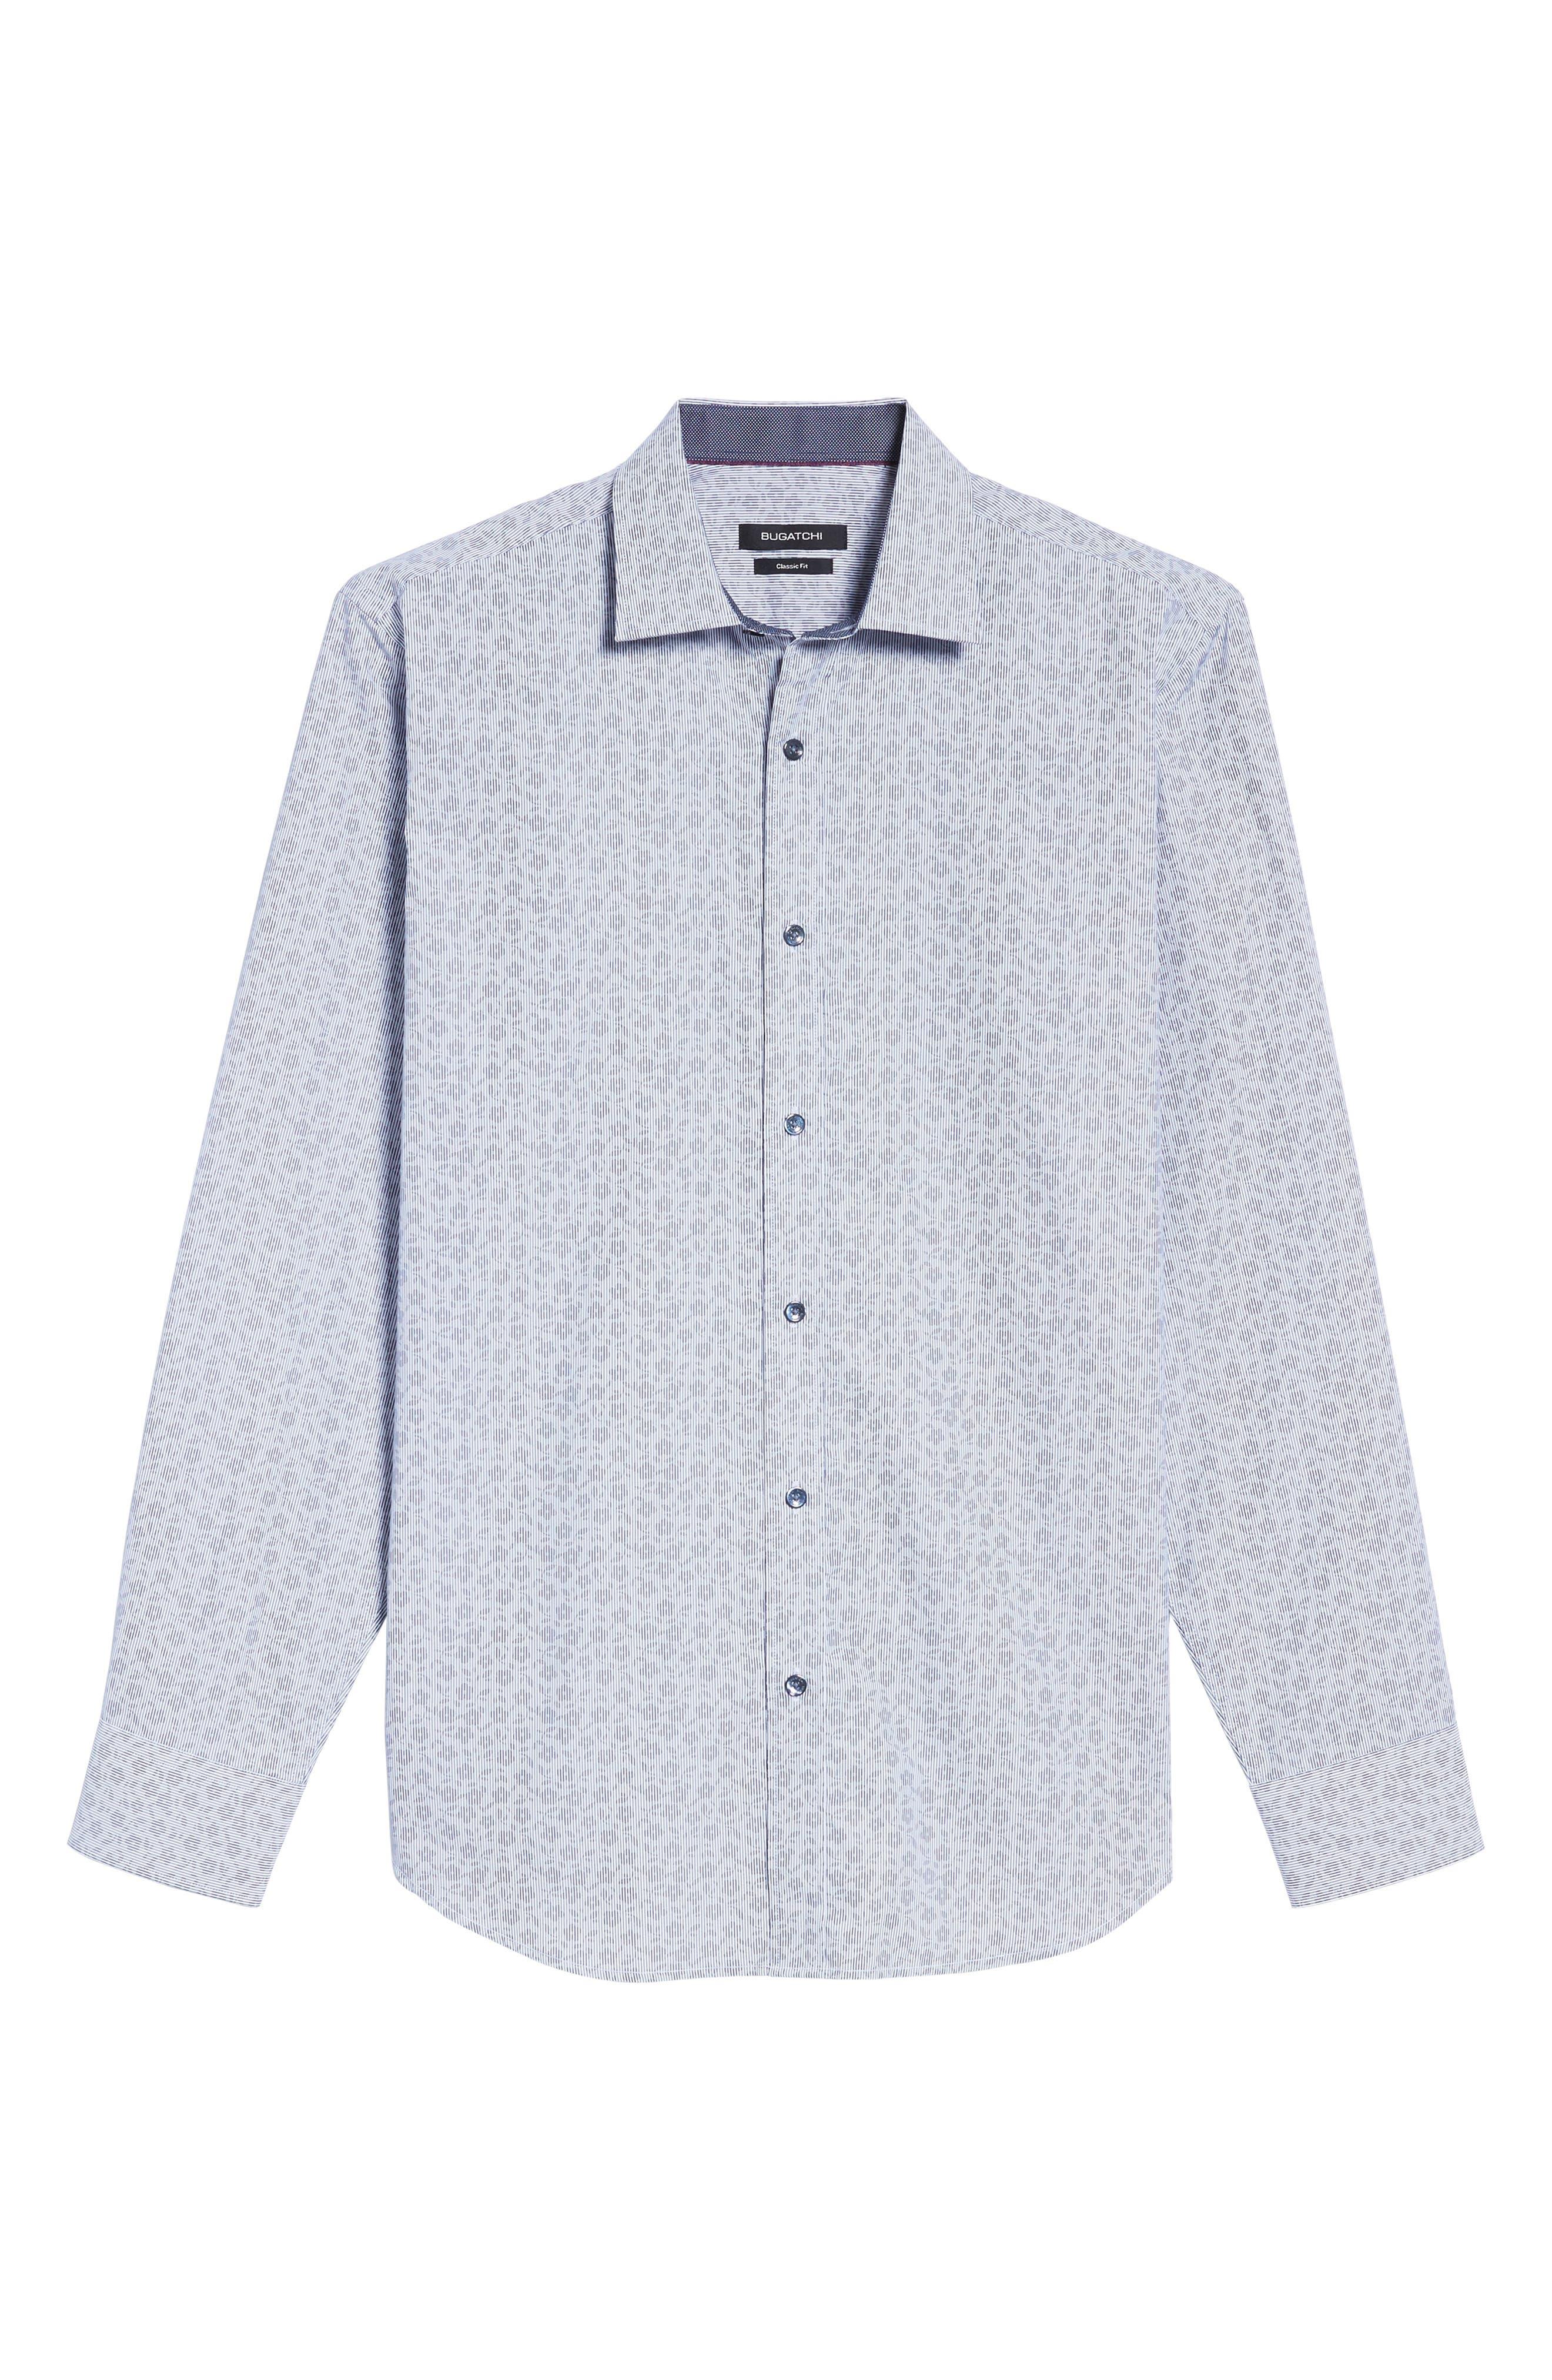 Classic Fit Floral Pinstripe Sport Shirt,                             Alternate thumbnail 6, color,                             030